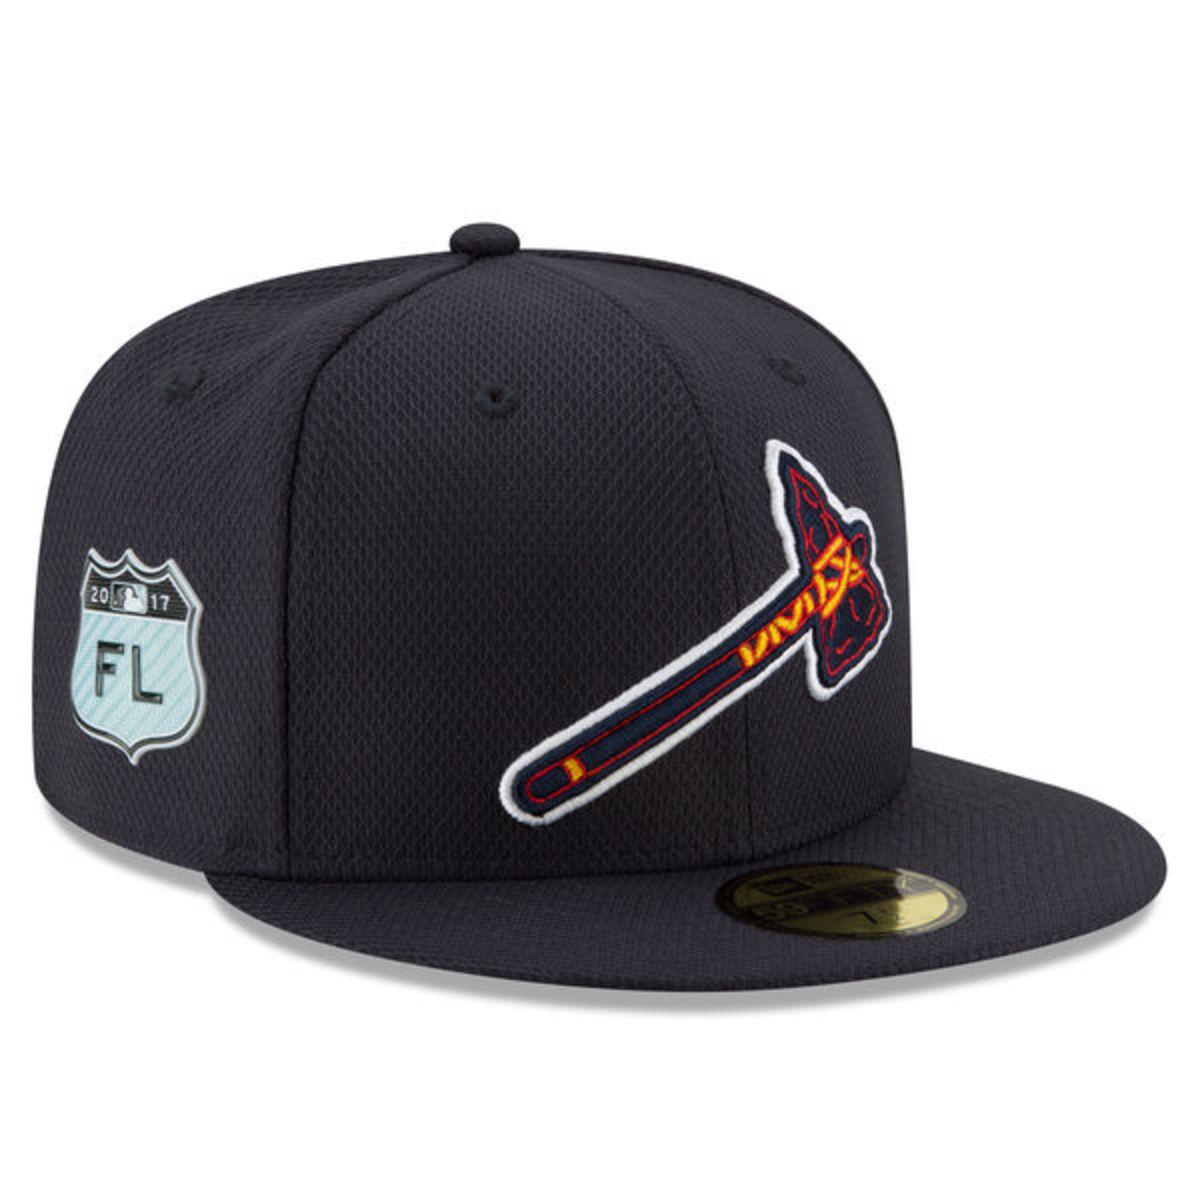 braves-spring-training-hat.jpg